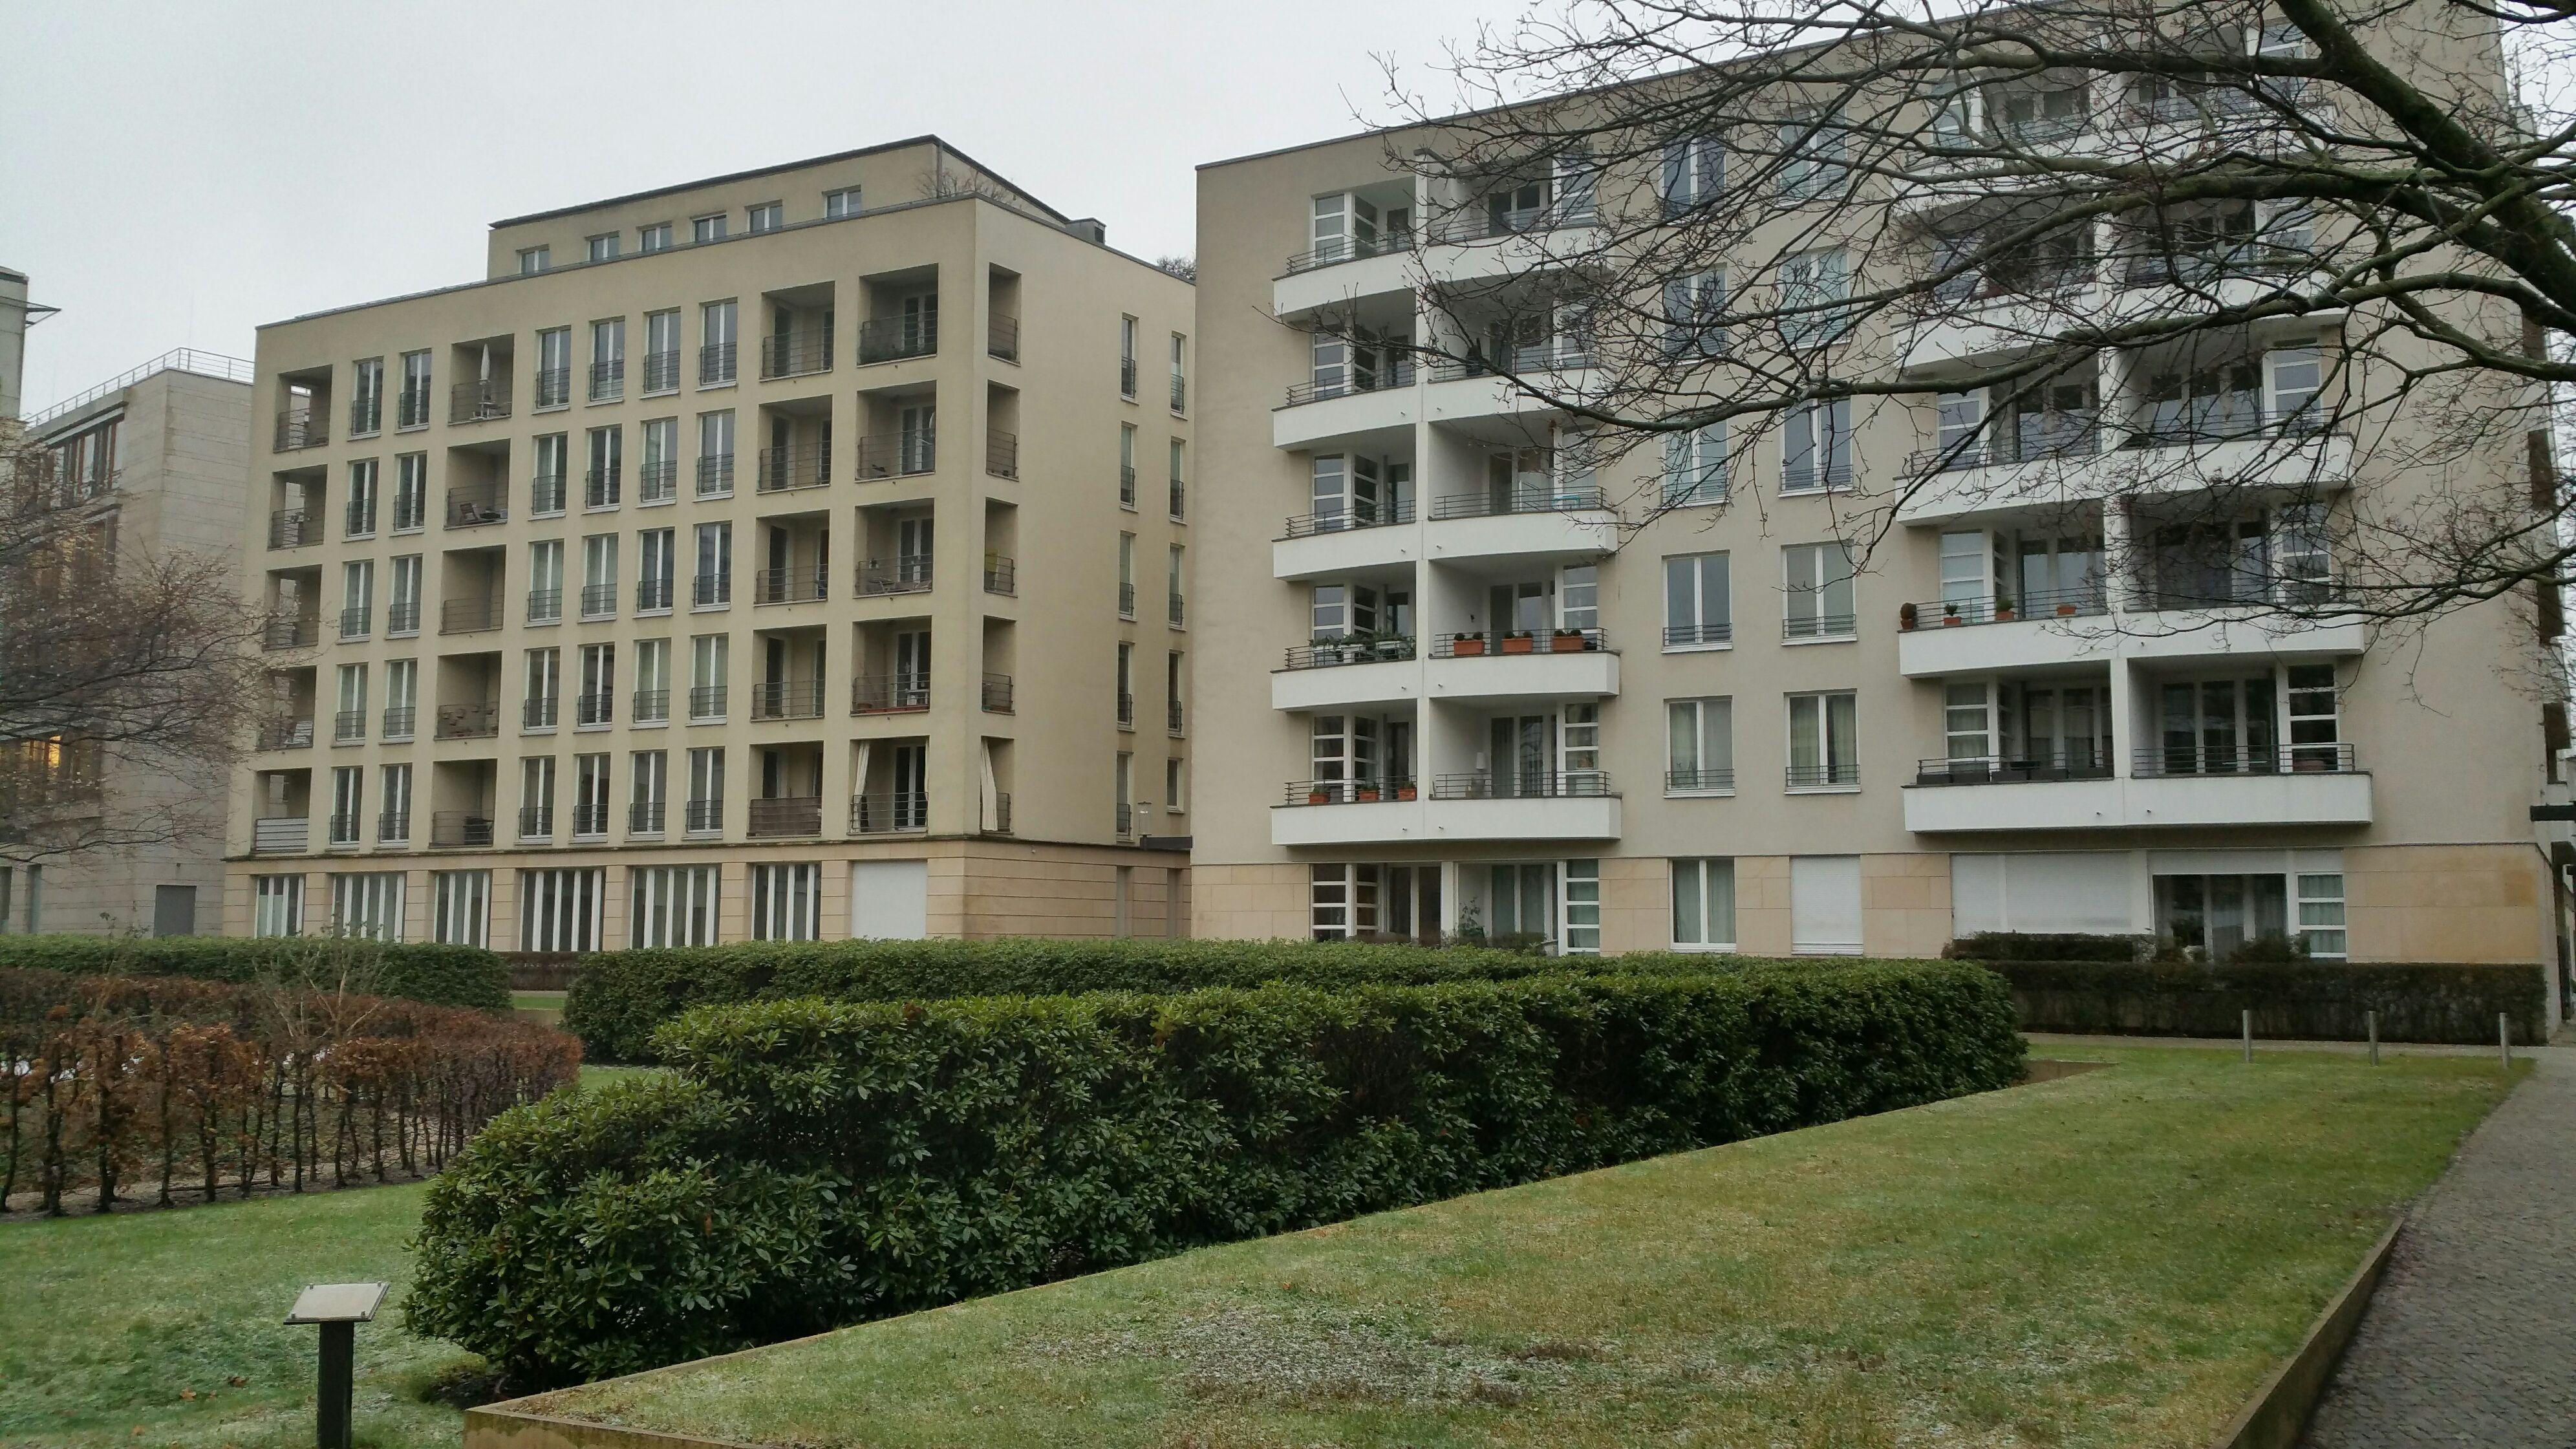 Stülerstraße